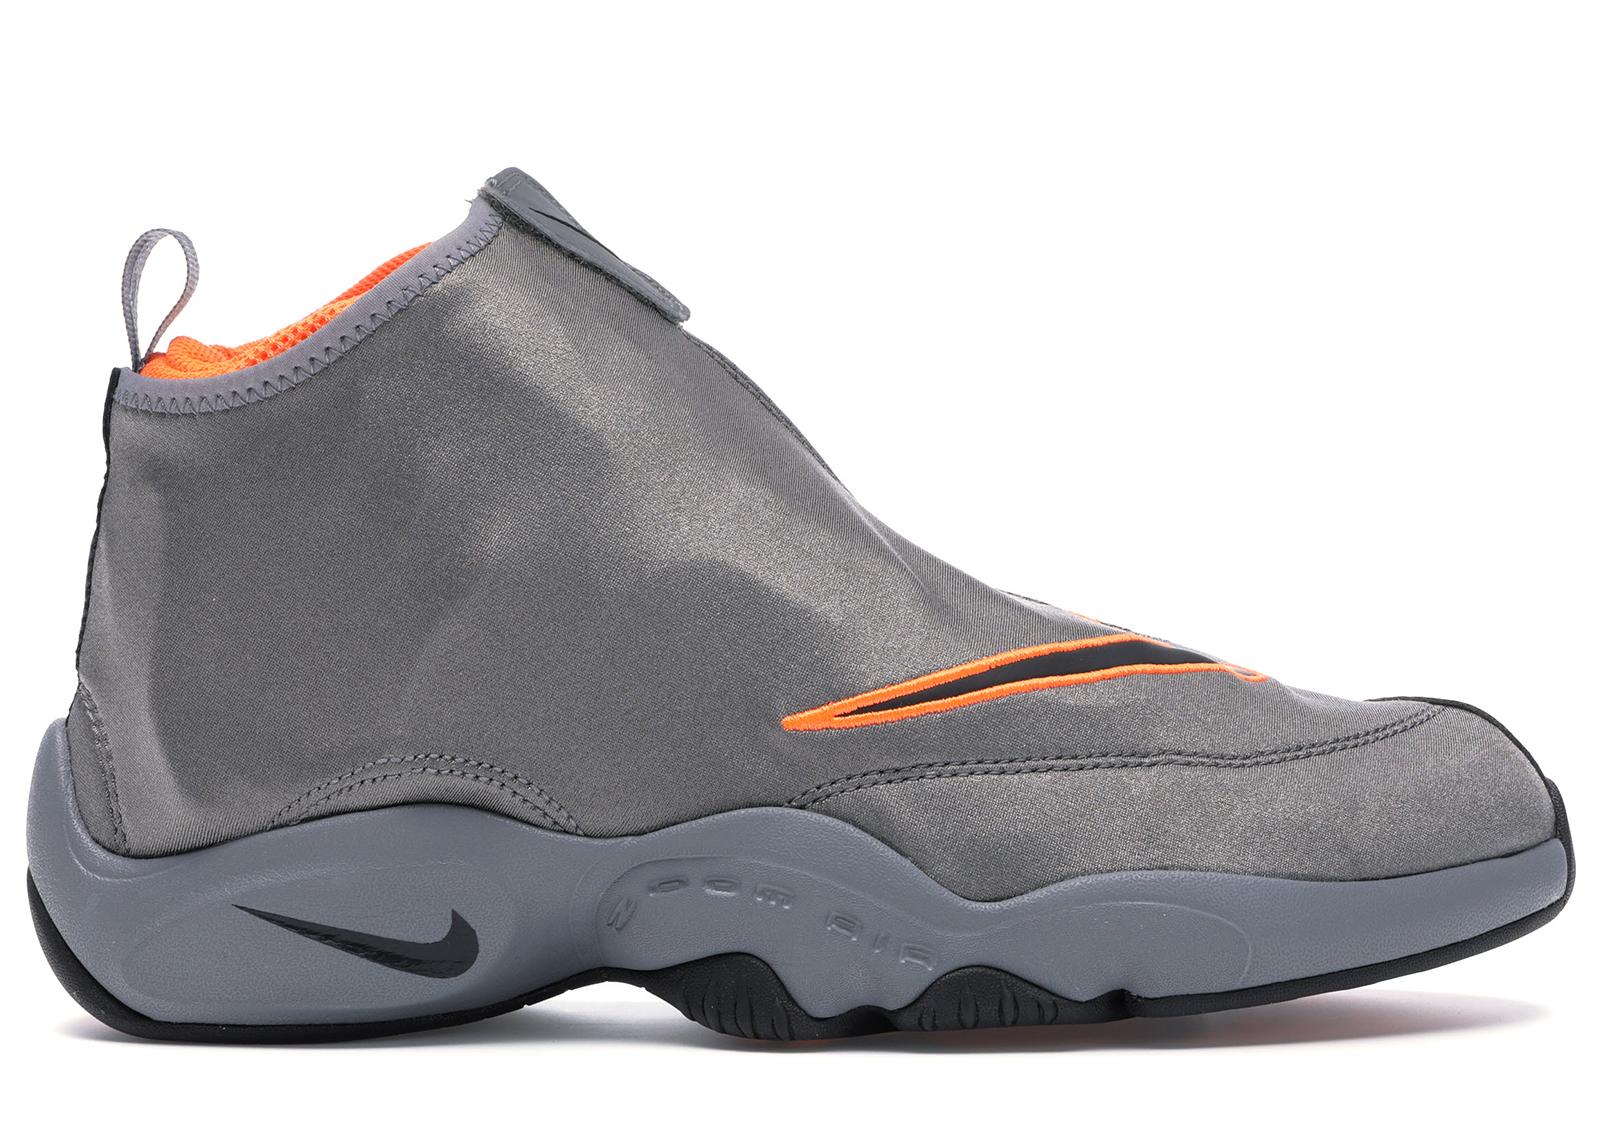 Nike Air Zoom Flight '98 The Glove Oregon State